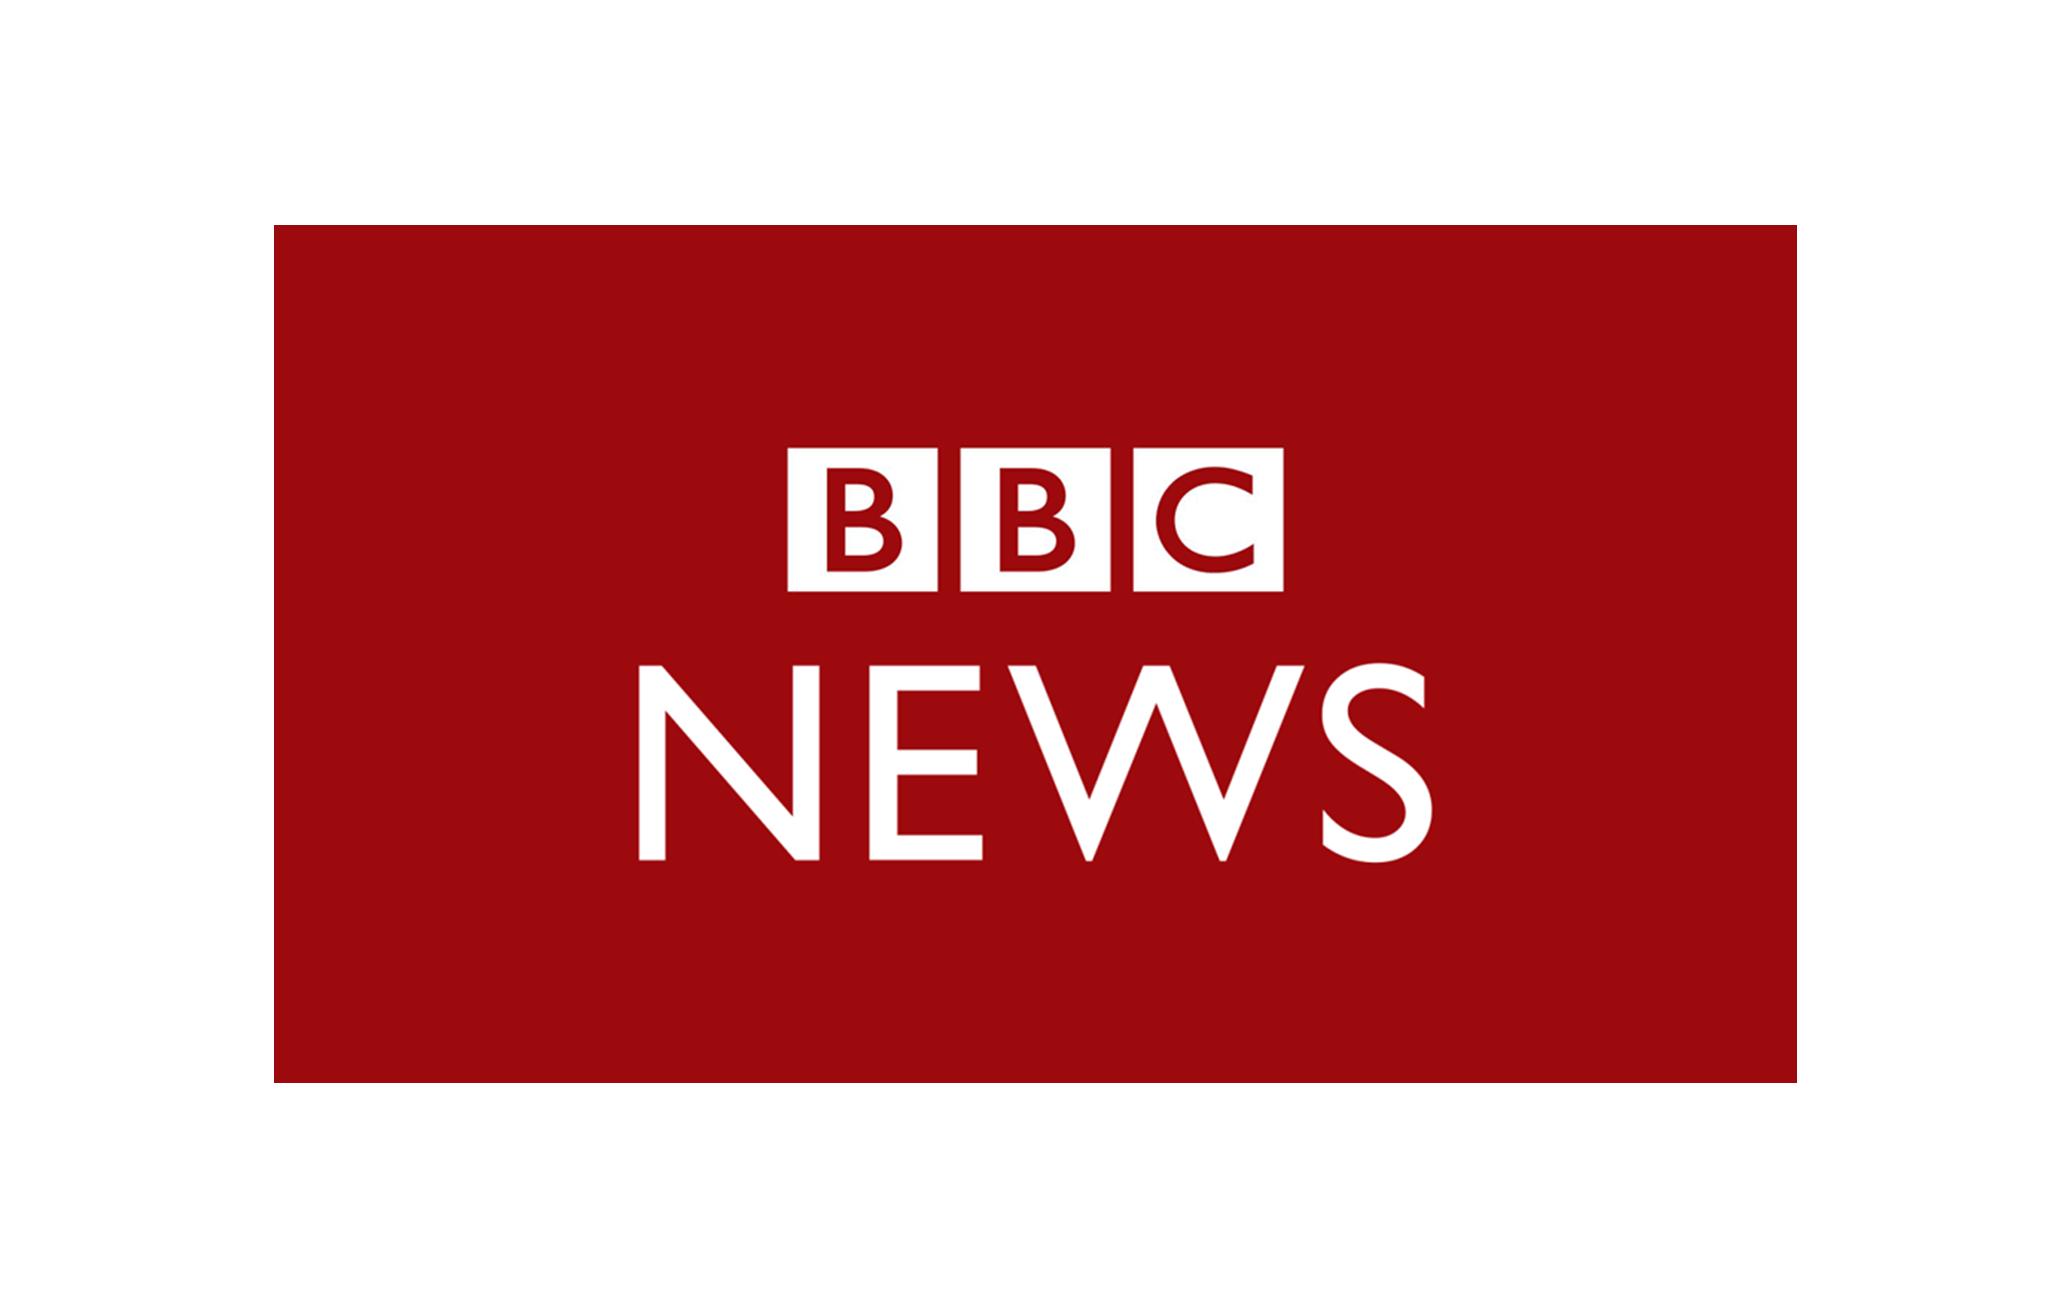 News Logos_v03 BBC News.png